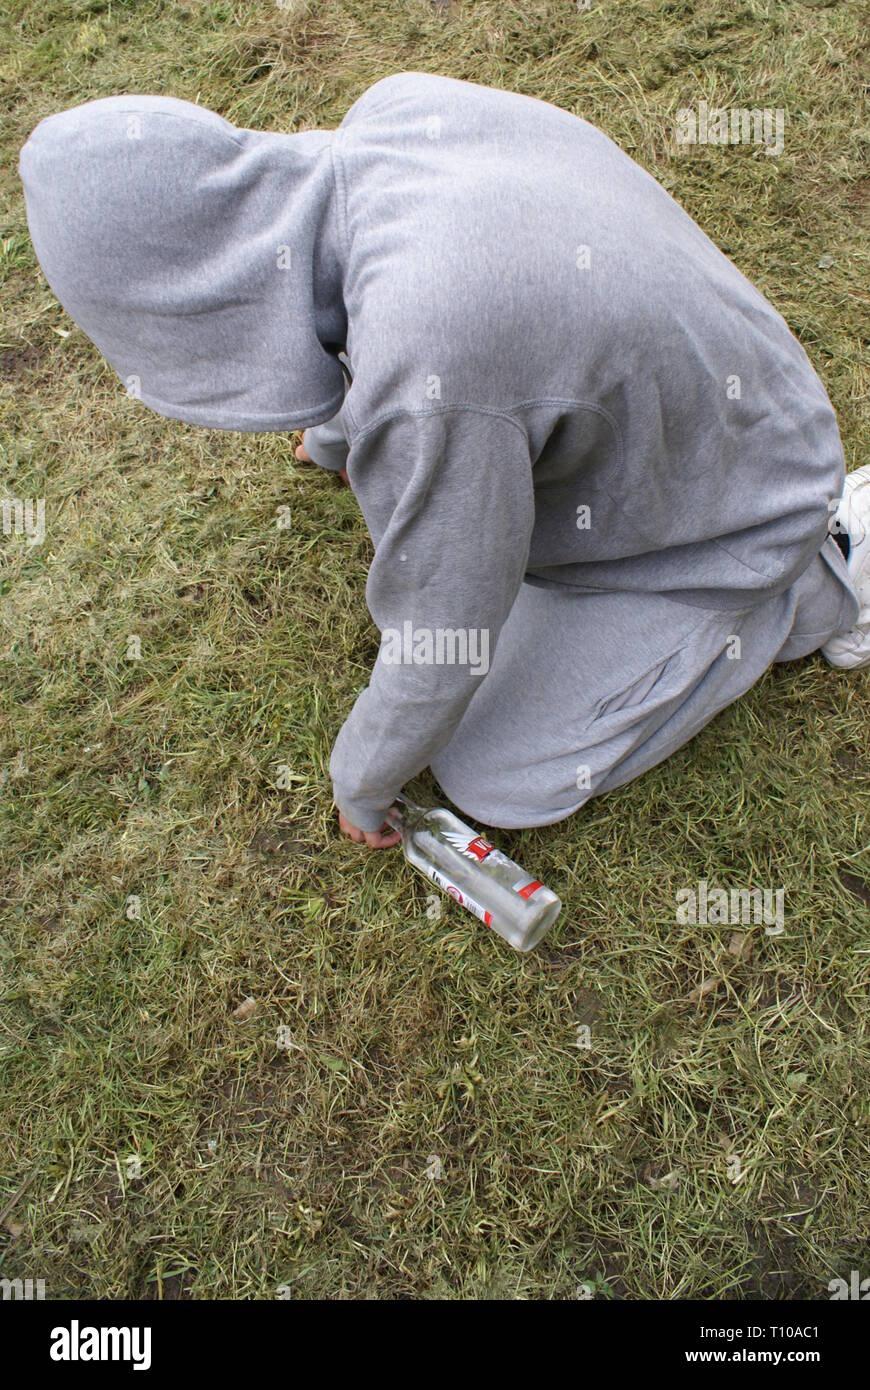 drunken teenager, alcohol abuse, - Stock Image